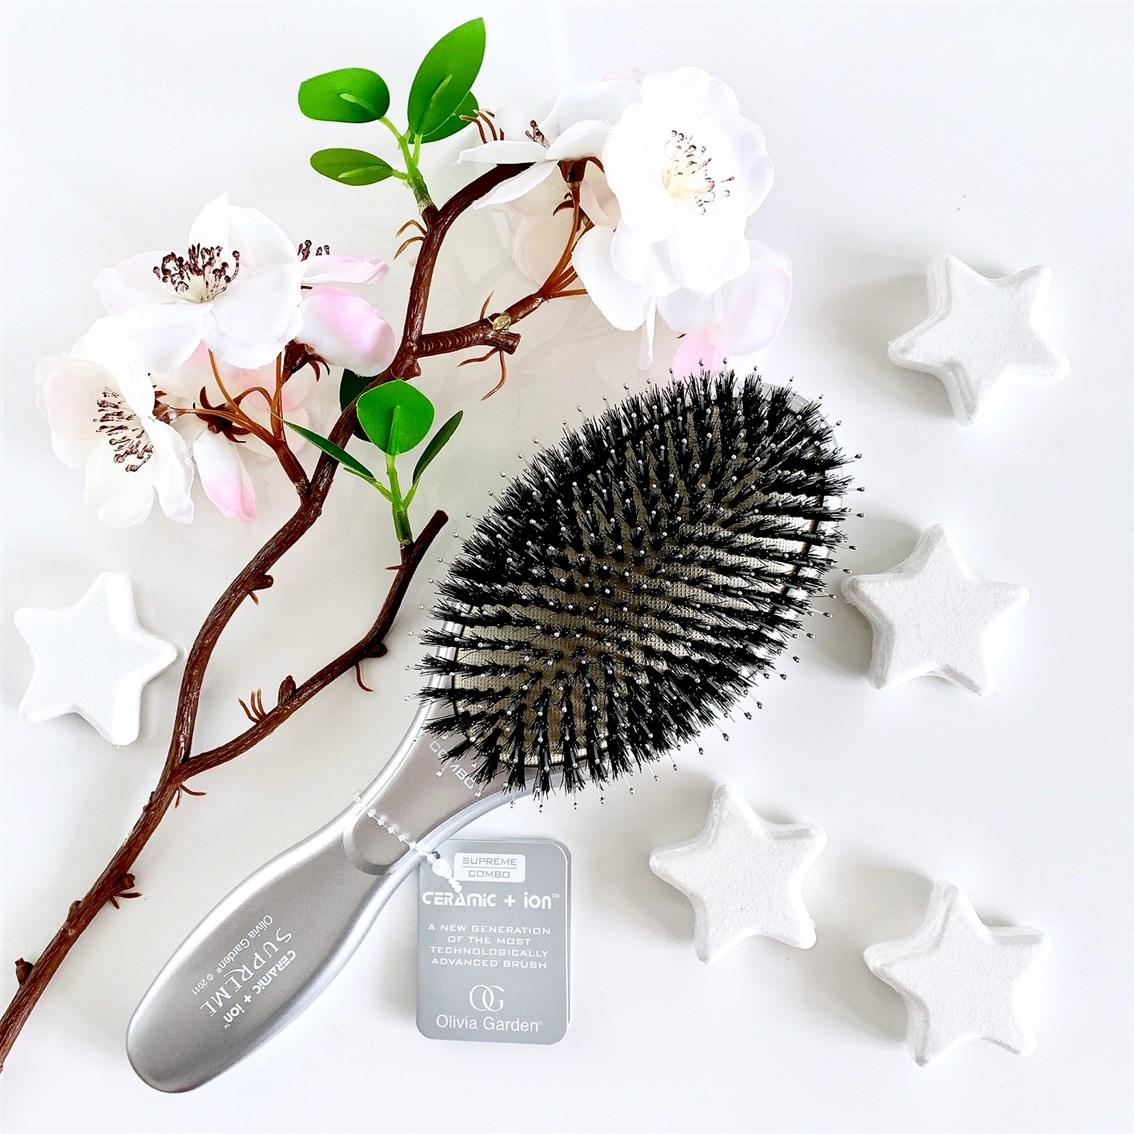 Olivia Garden Supreme Combo Ceramic + Ion